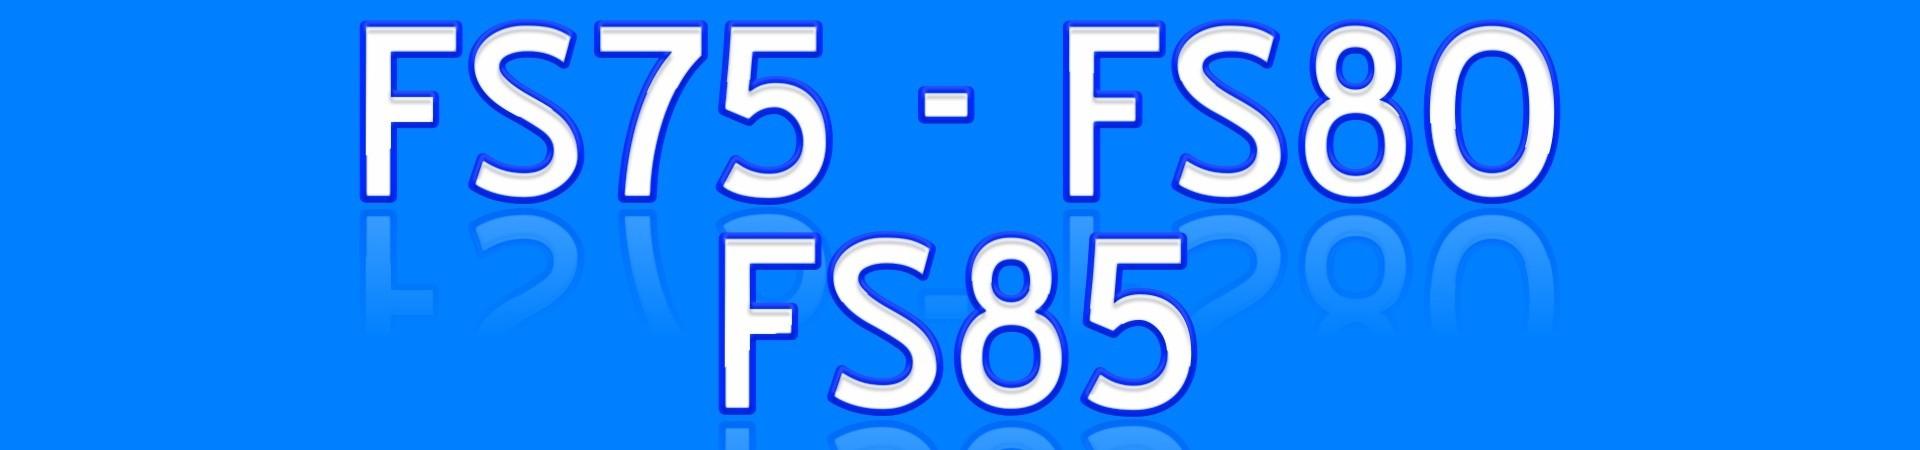 REPUESTOS para Desbrozadora STIHL FS75 FS80 FS85